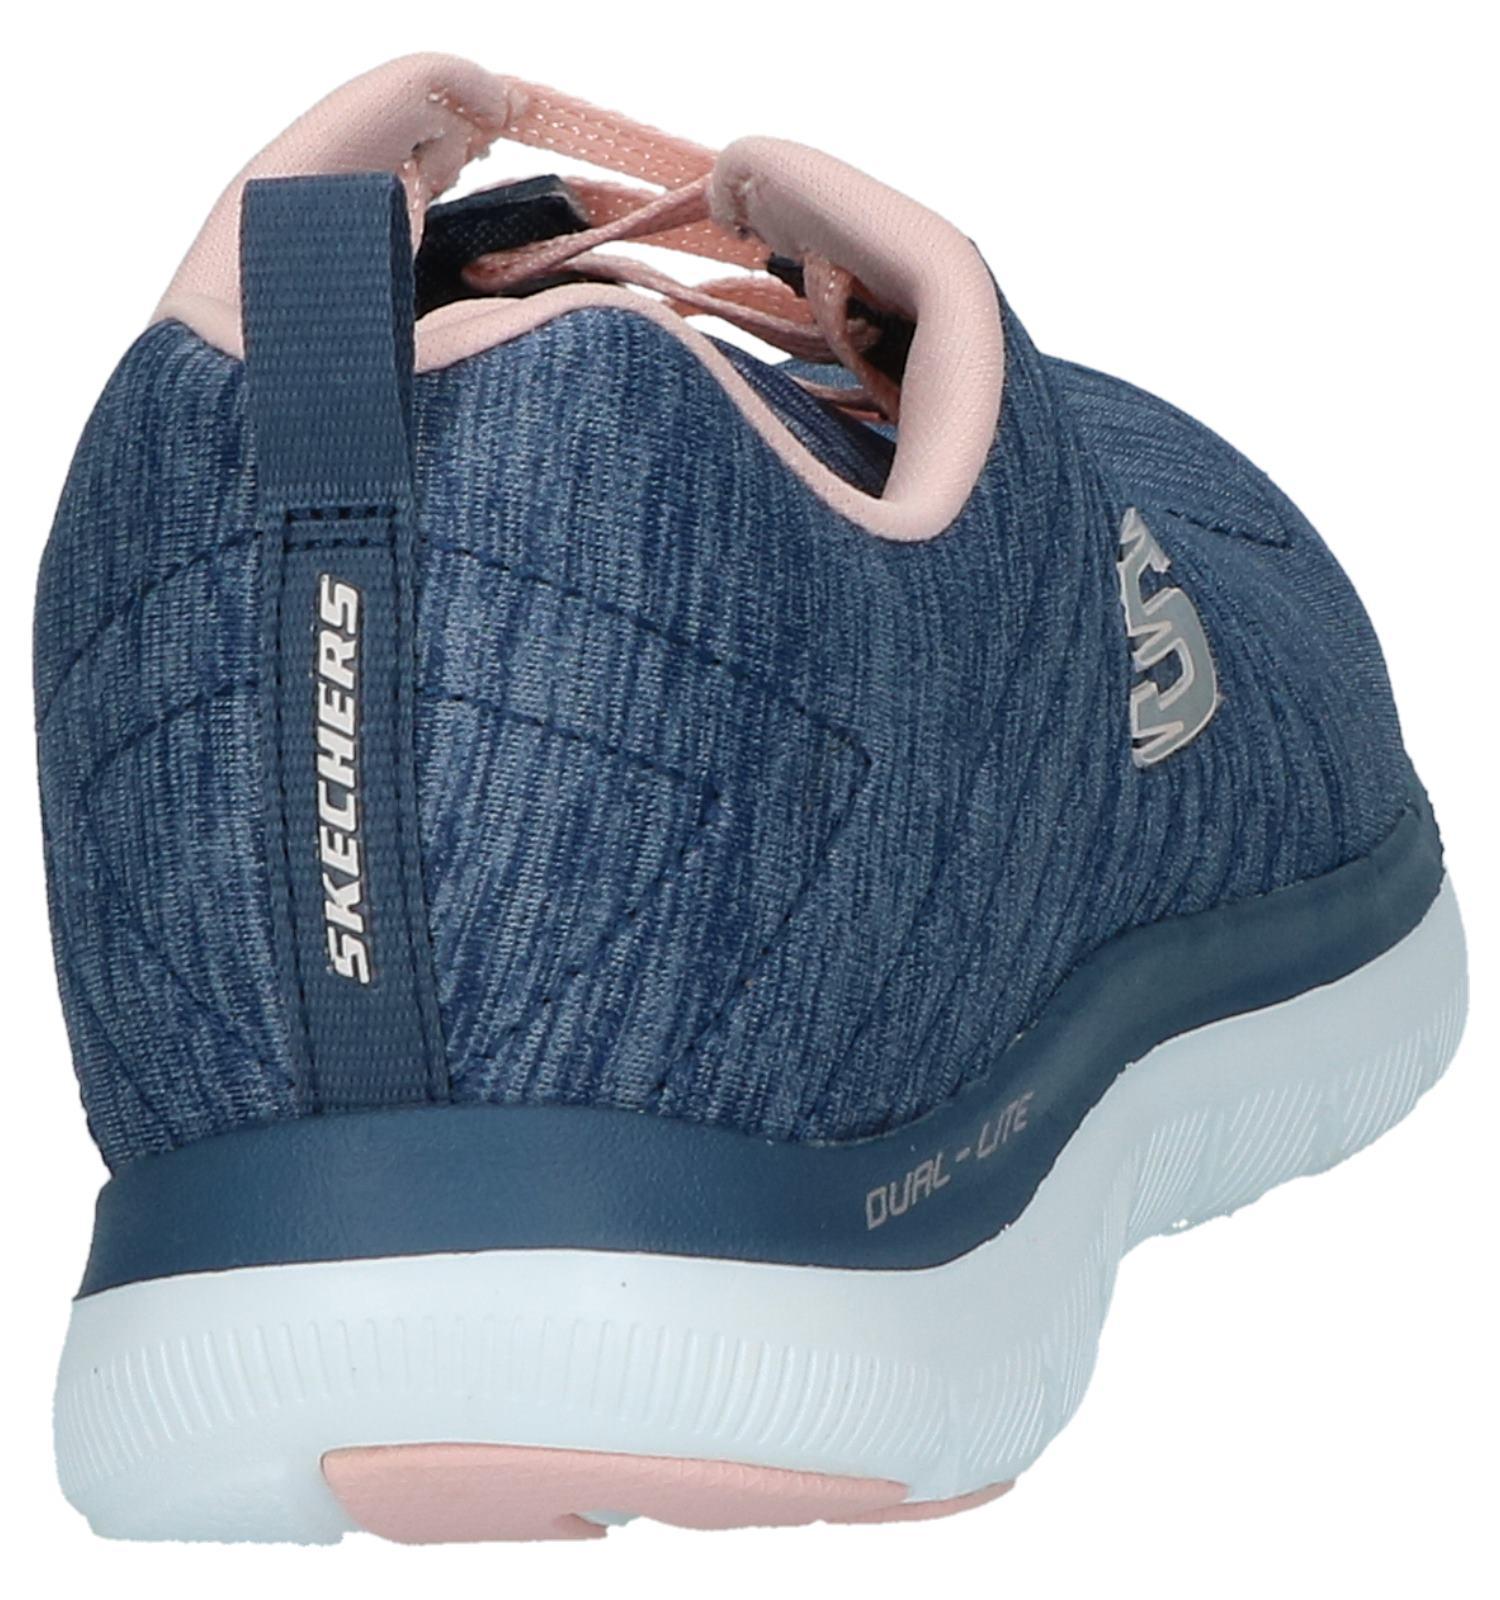 Skechers Baskets basses (Bleu) | TORFS.BE | Livraison et